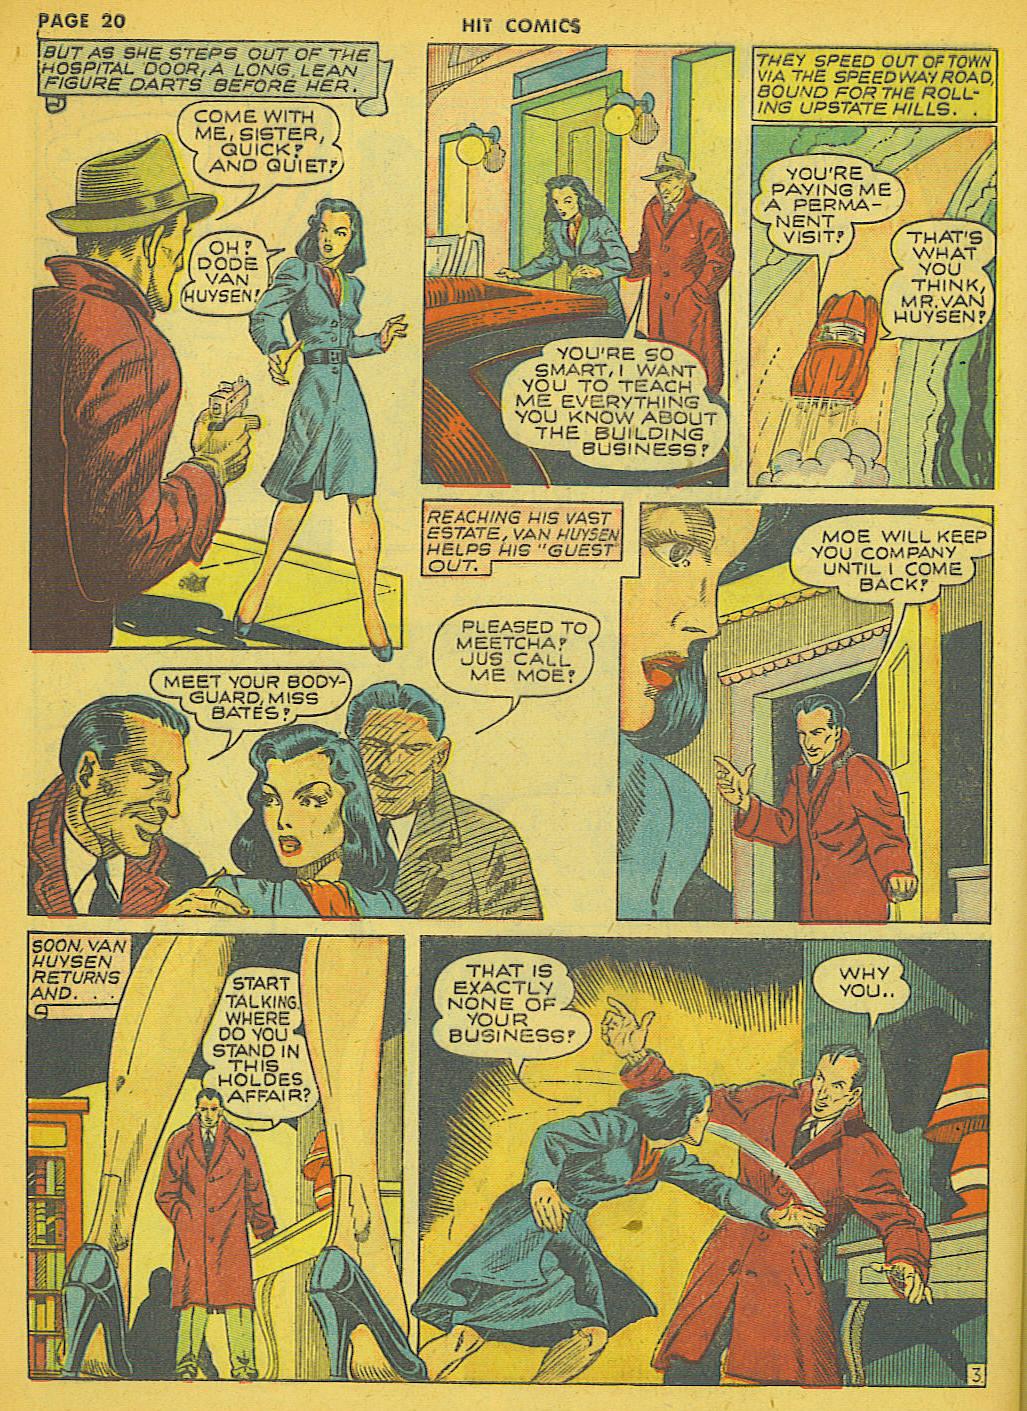 Read online Hit Comics comic -  Issue #21 - 22